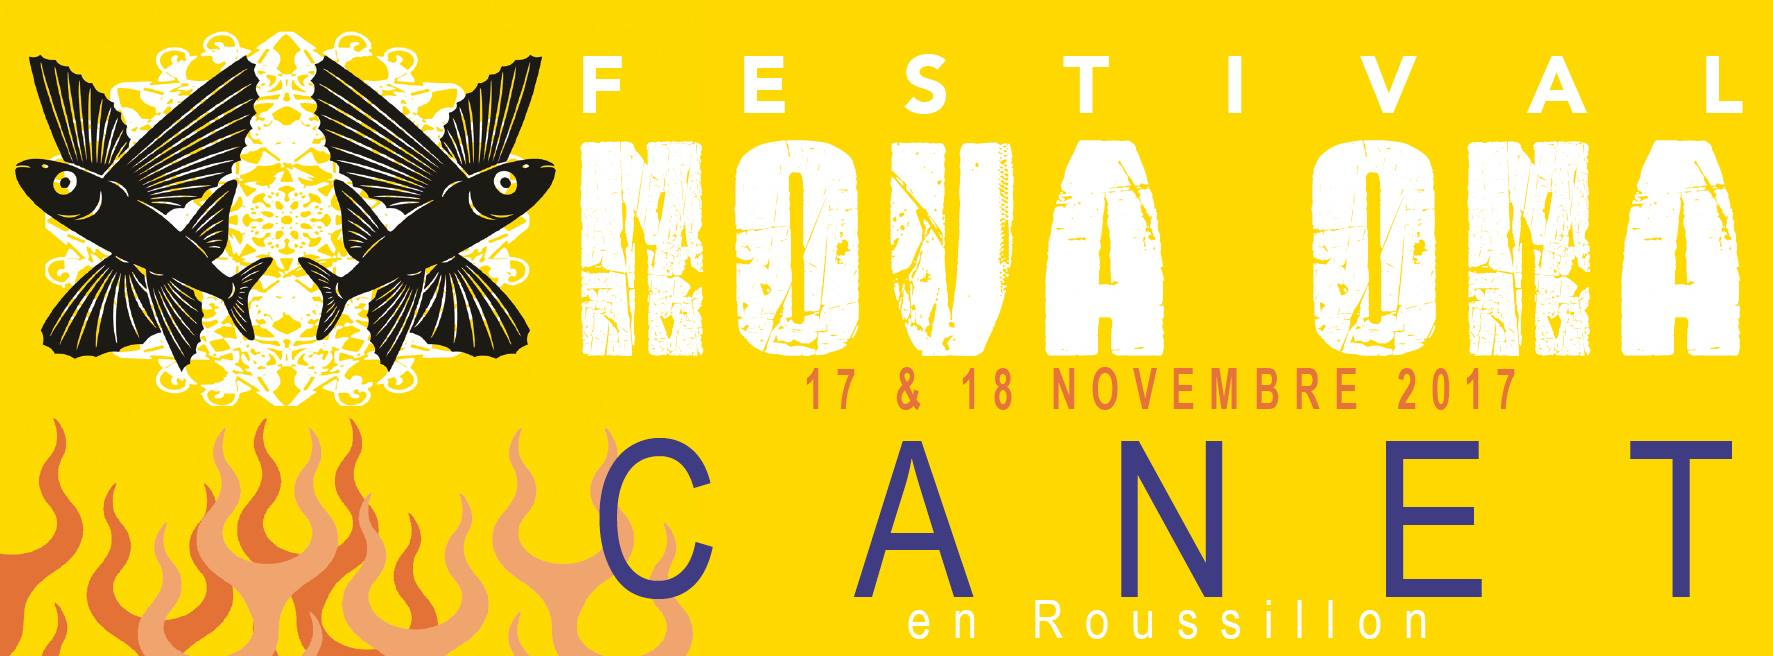 Festival Nova Ona